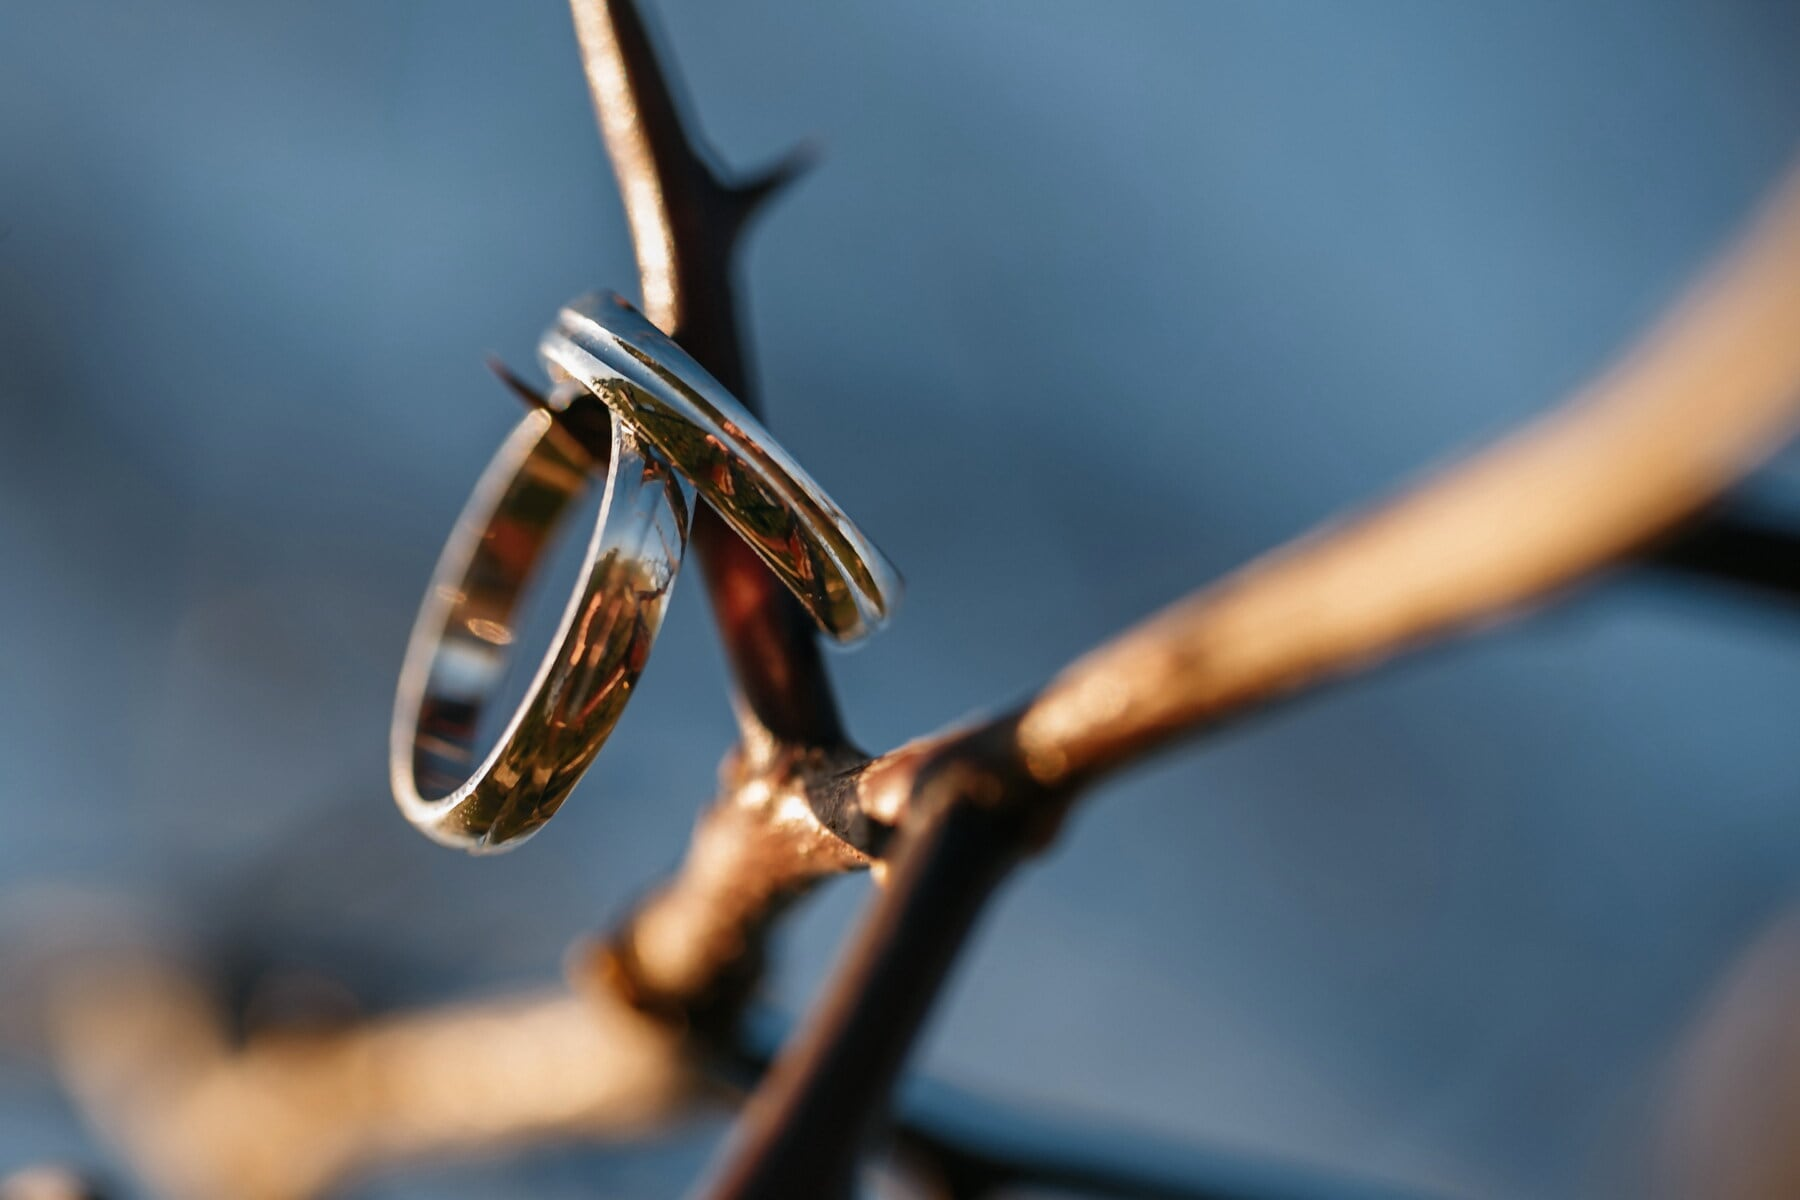 metallic, jewelry, rings, thorn, blur, outdoors, wood, nature, still life, focus